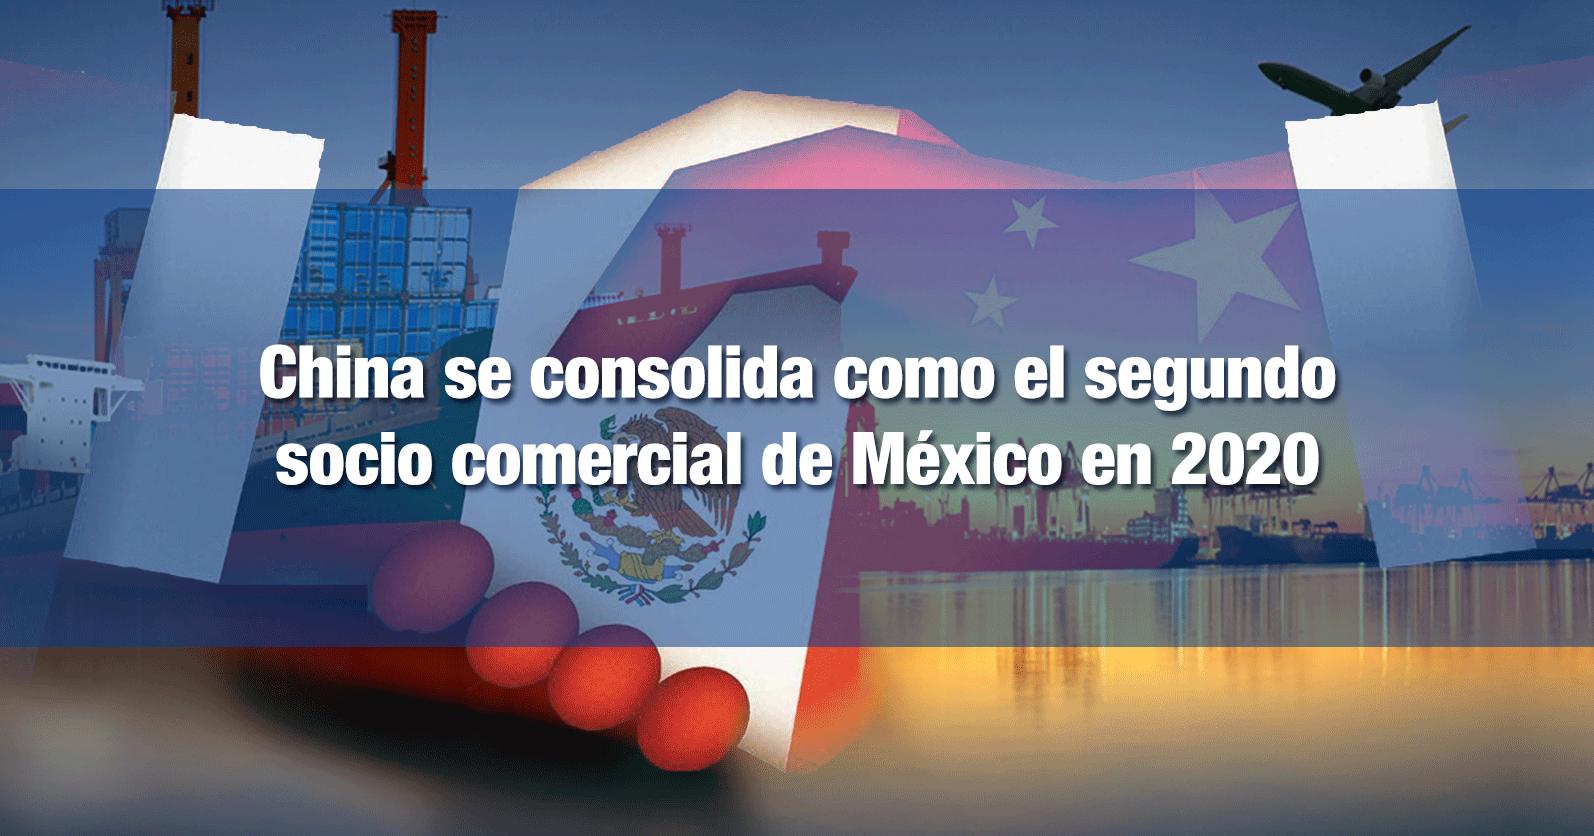 China se consolida como el segundo socio comercial de México en 2020